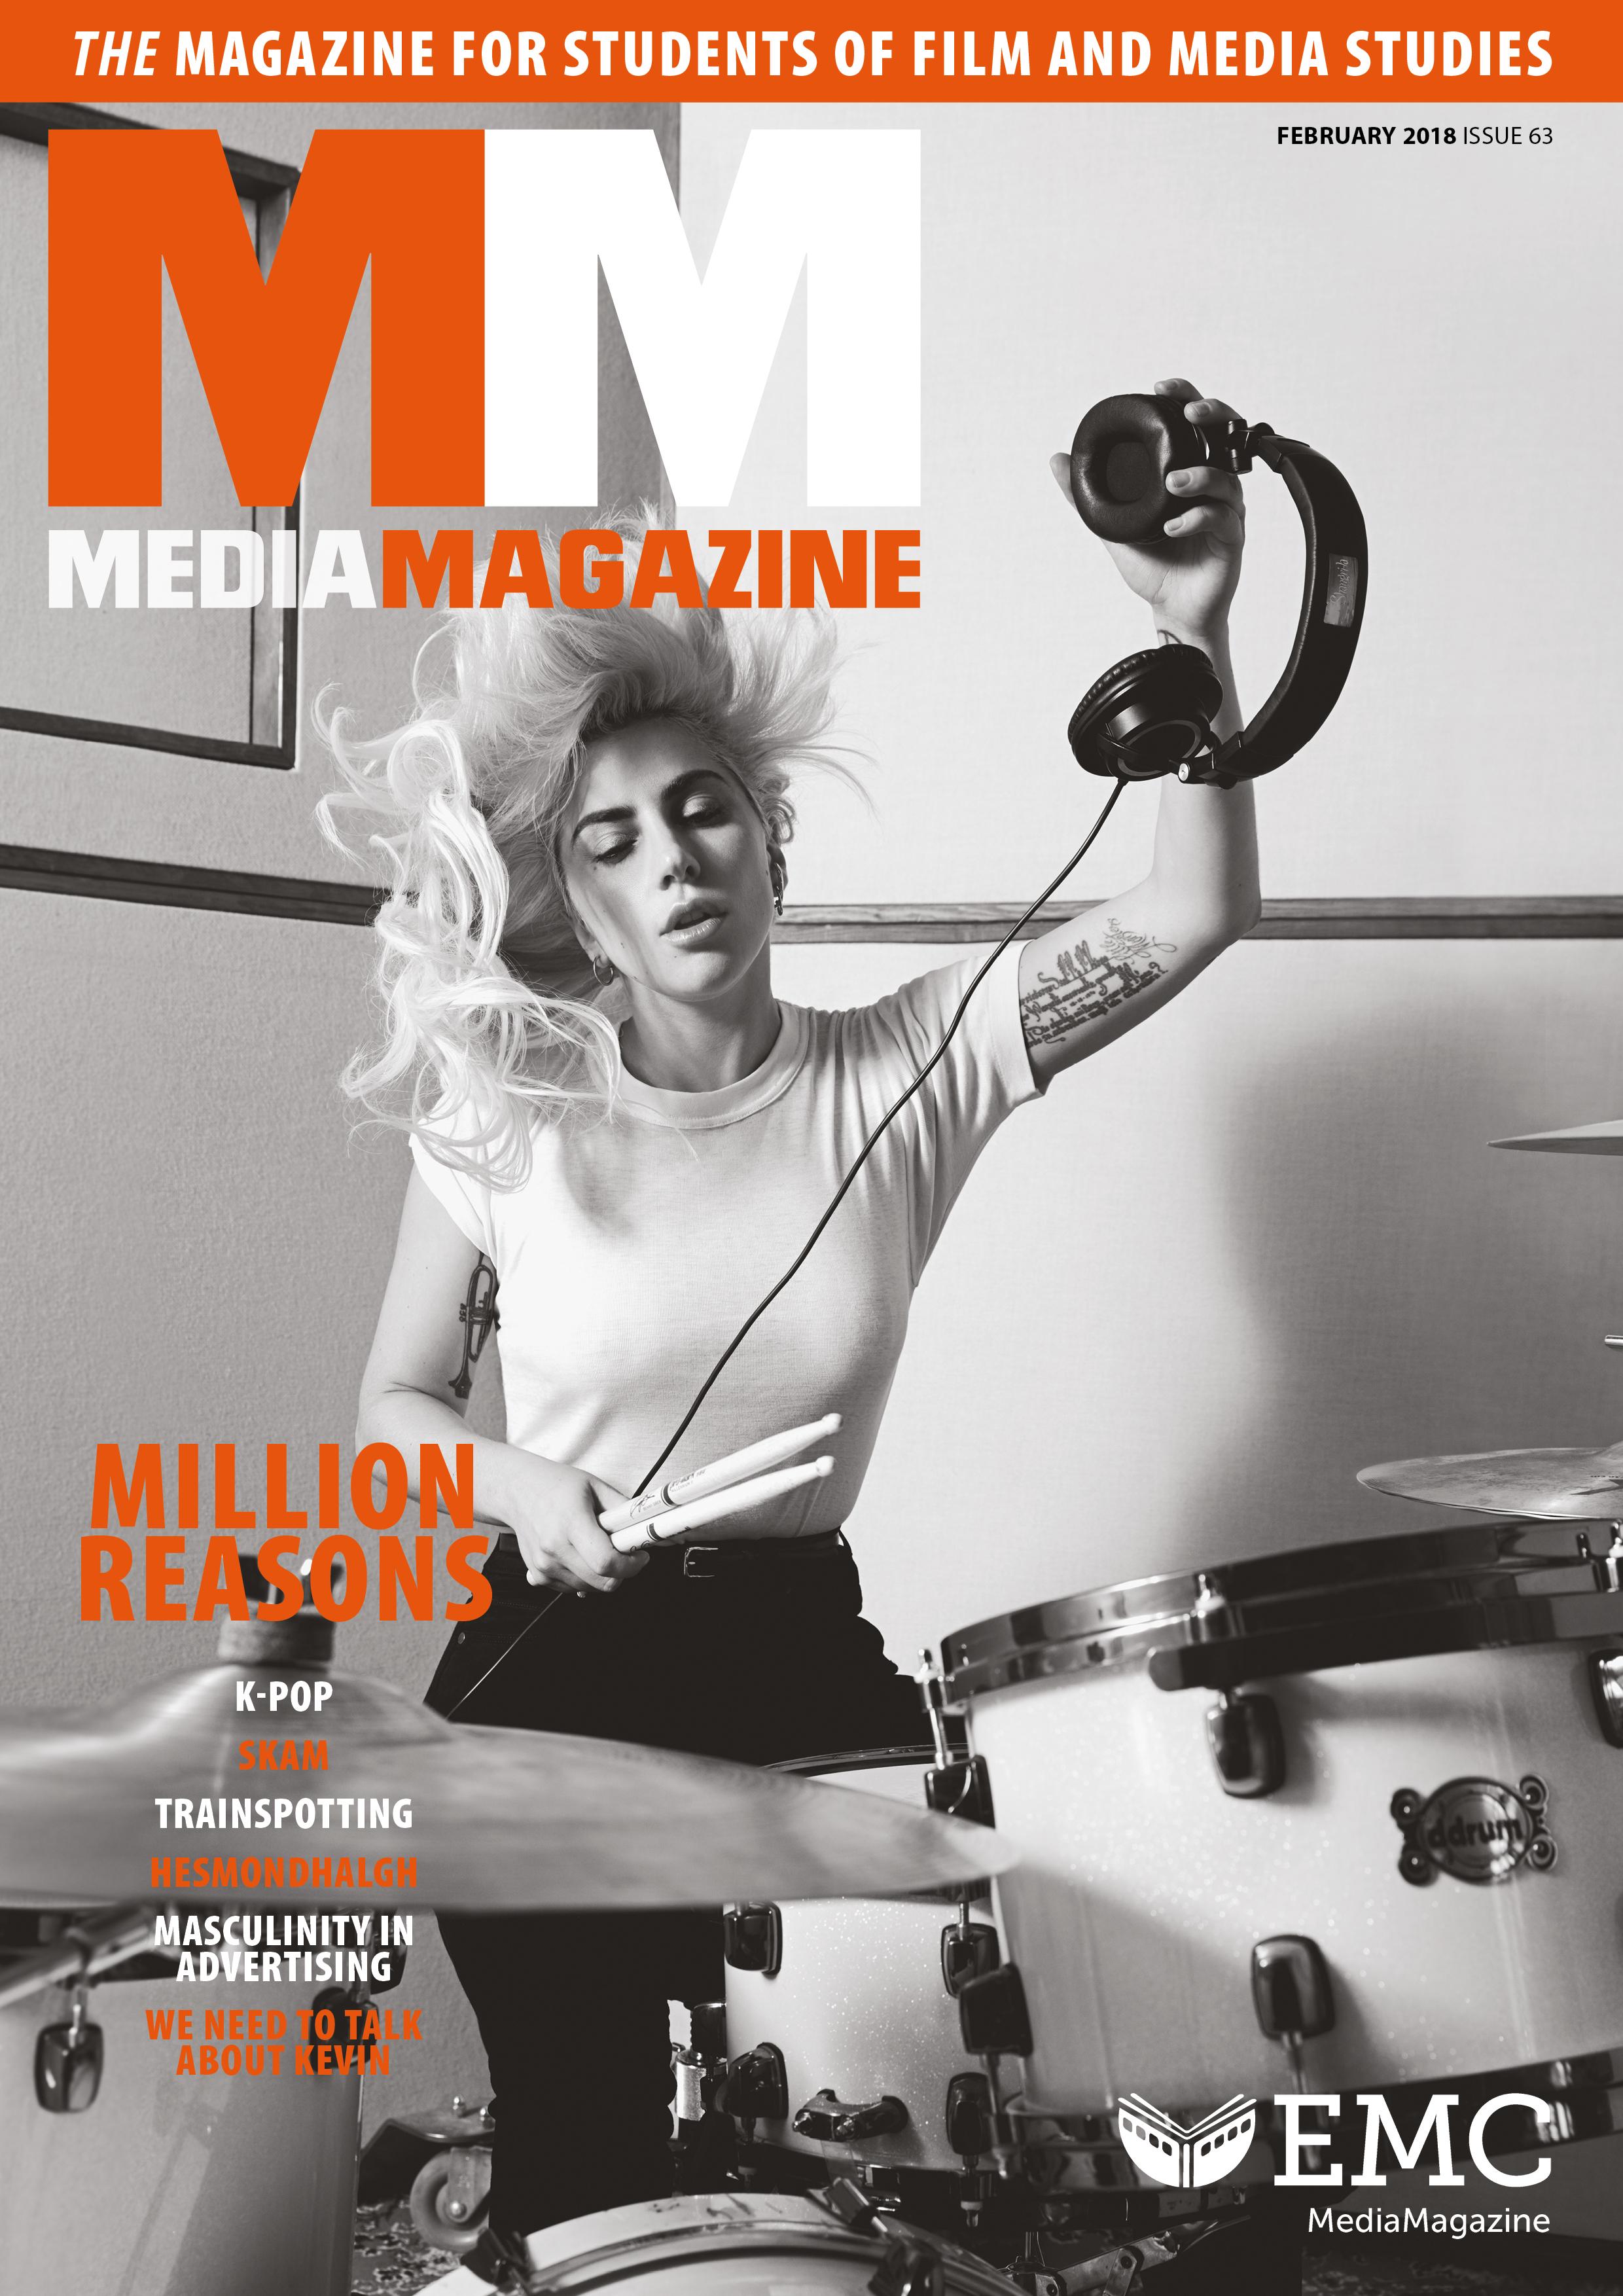 MediaMagazine 63 front cover